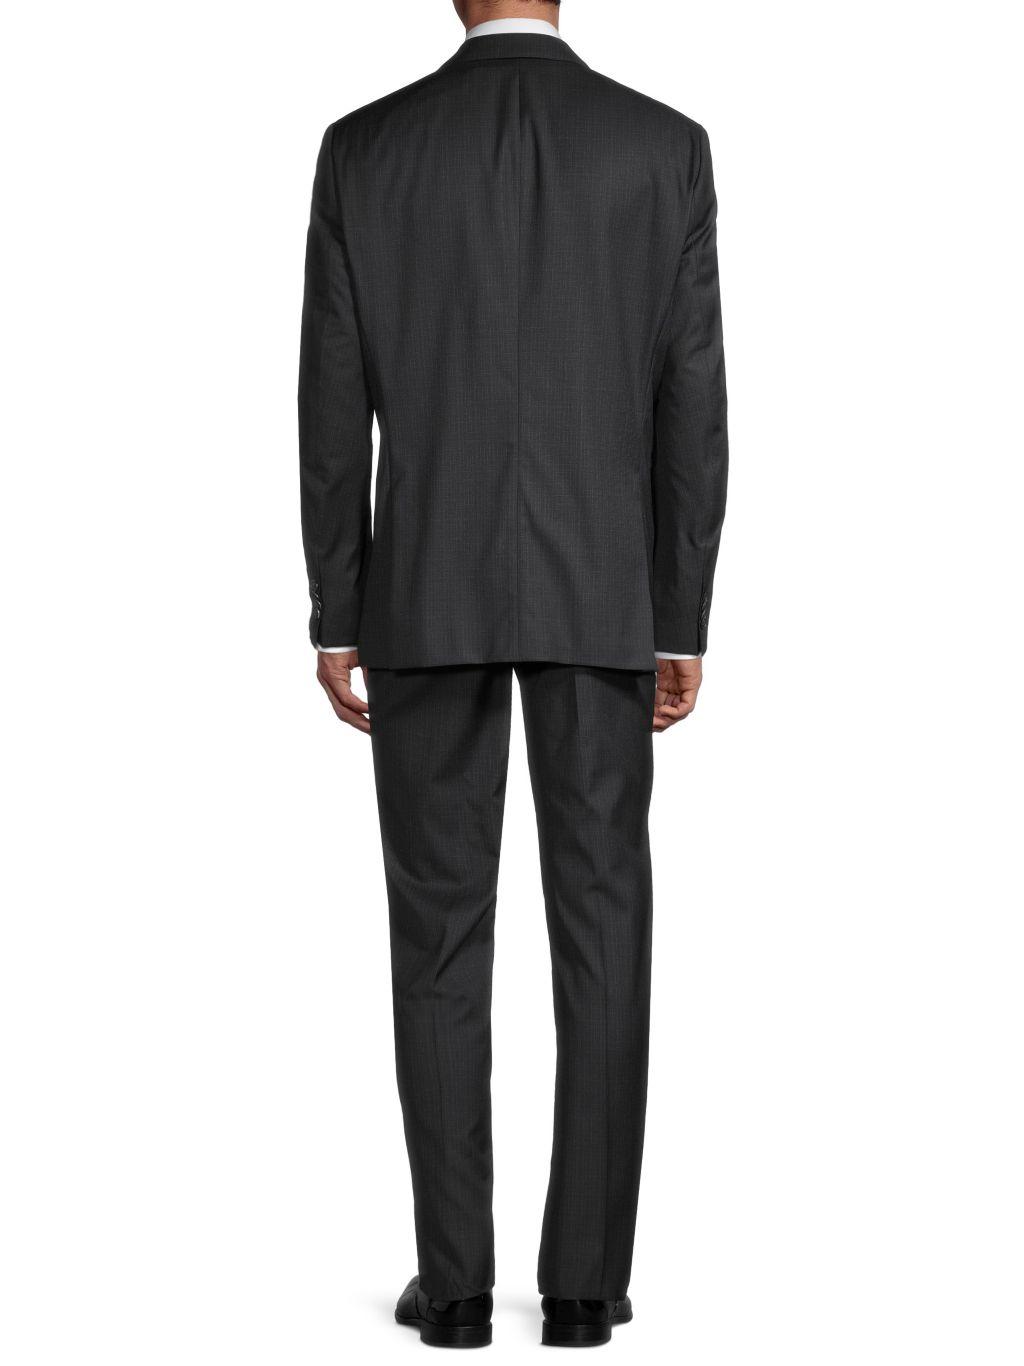 Hugo Boss Super 110 Phoenix/Madisen Regular-Fit Virgin Wool Suit